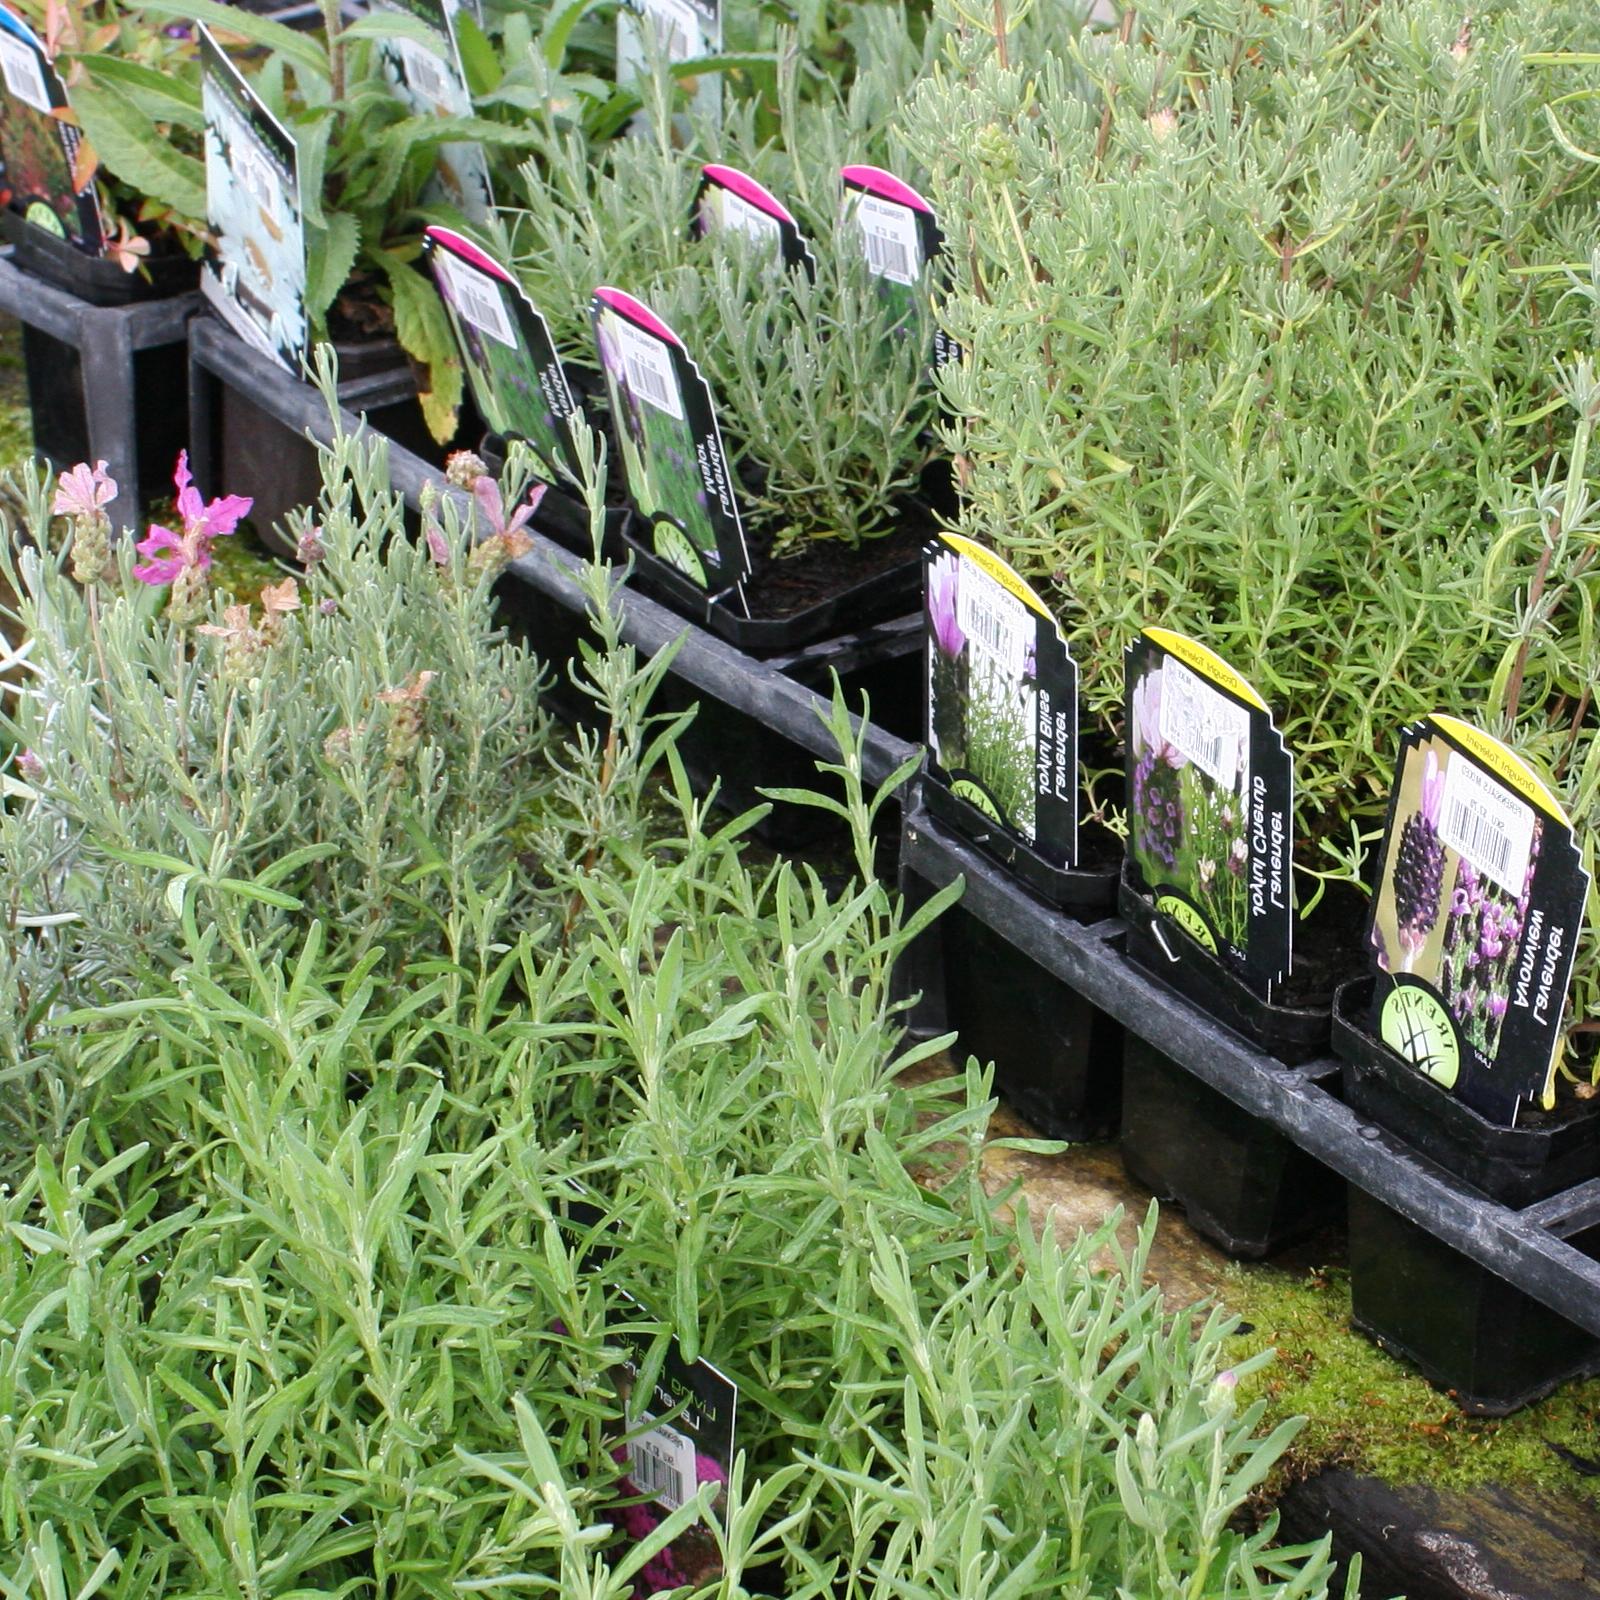 Perennials3 for $20 -